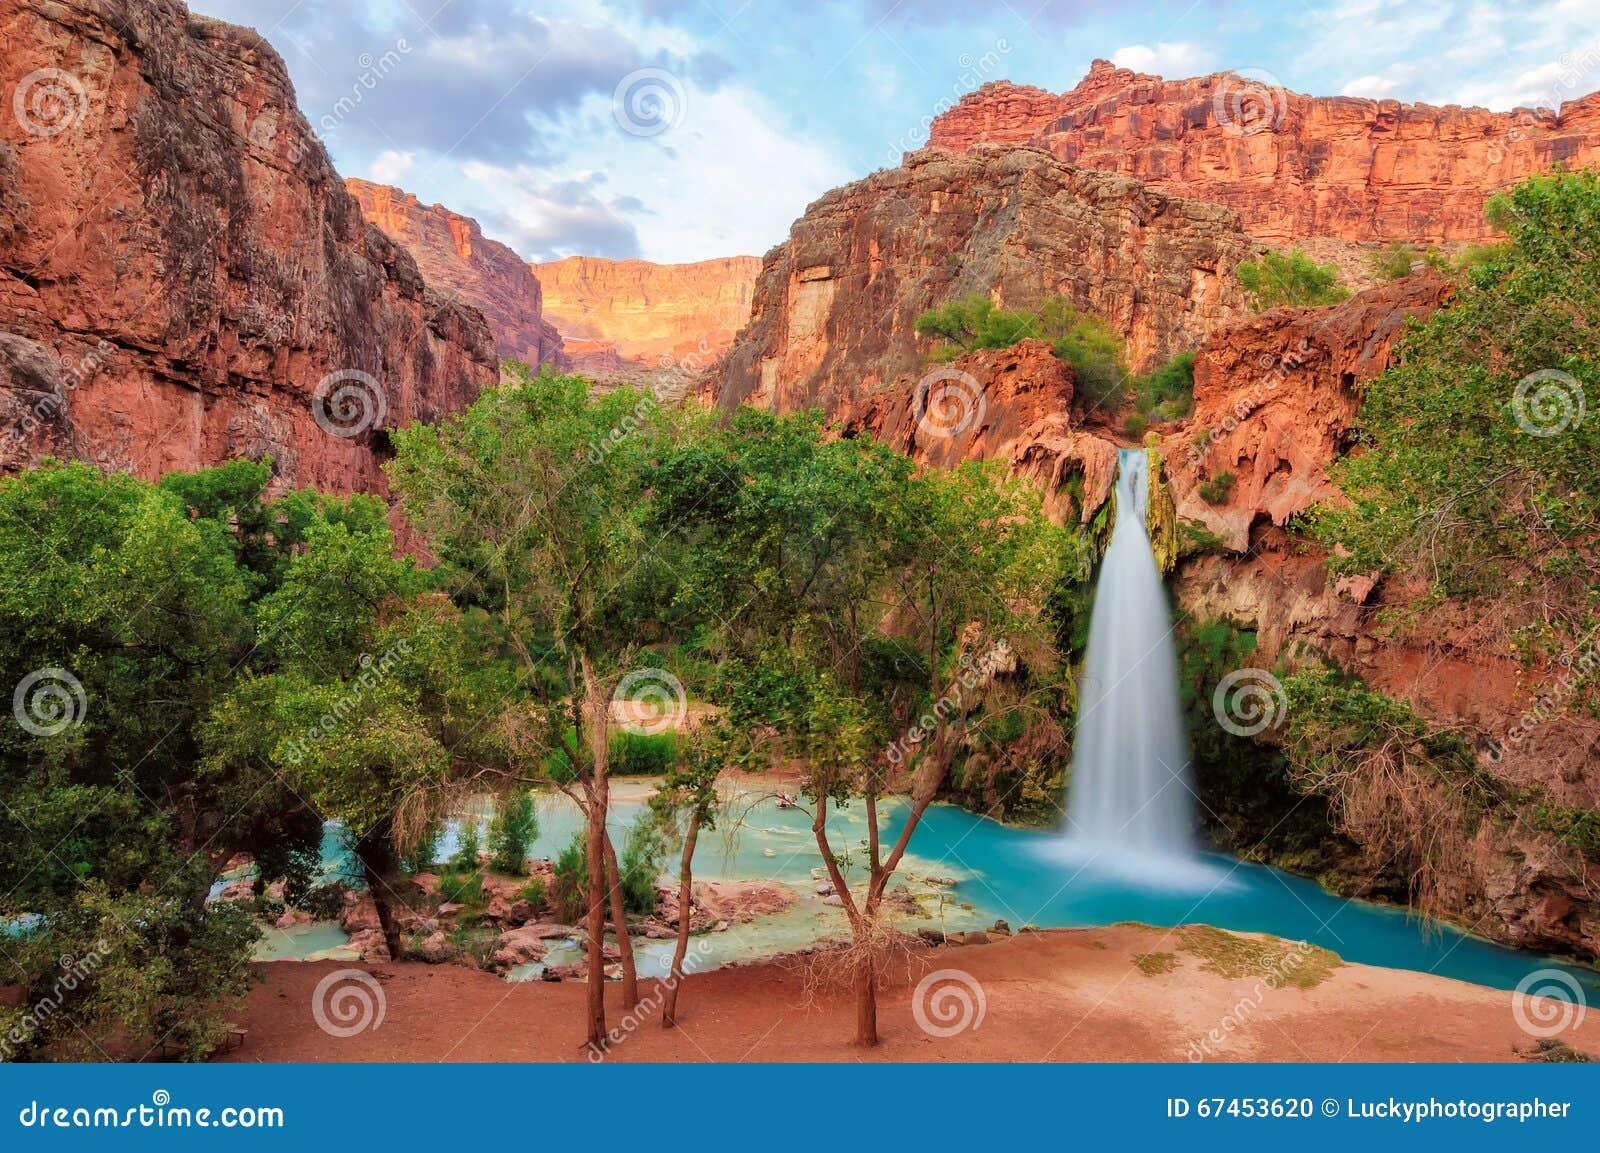 Grand Canyon, amazing havasu falls in Arizona